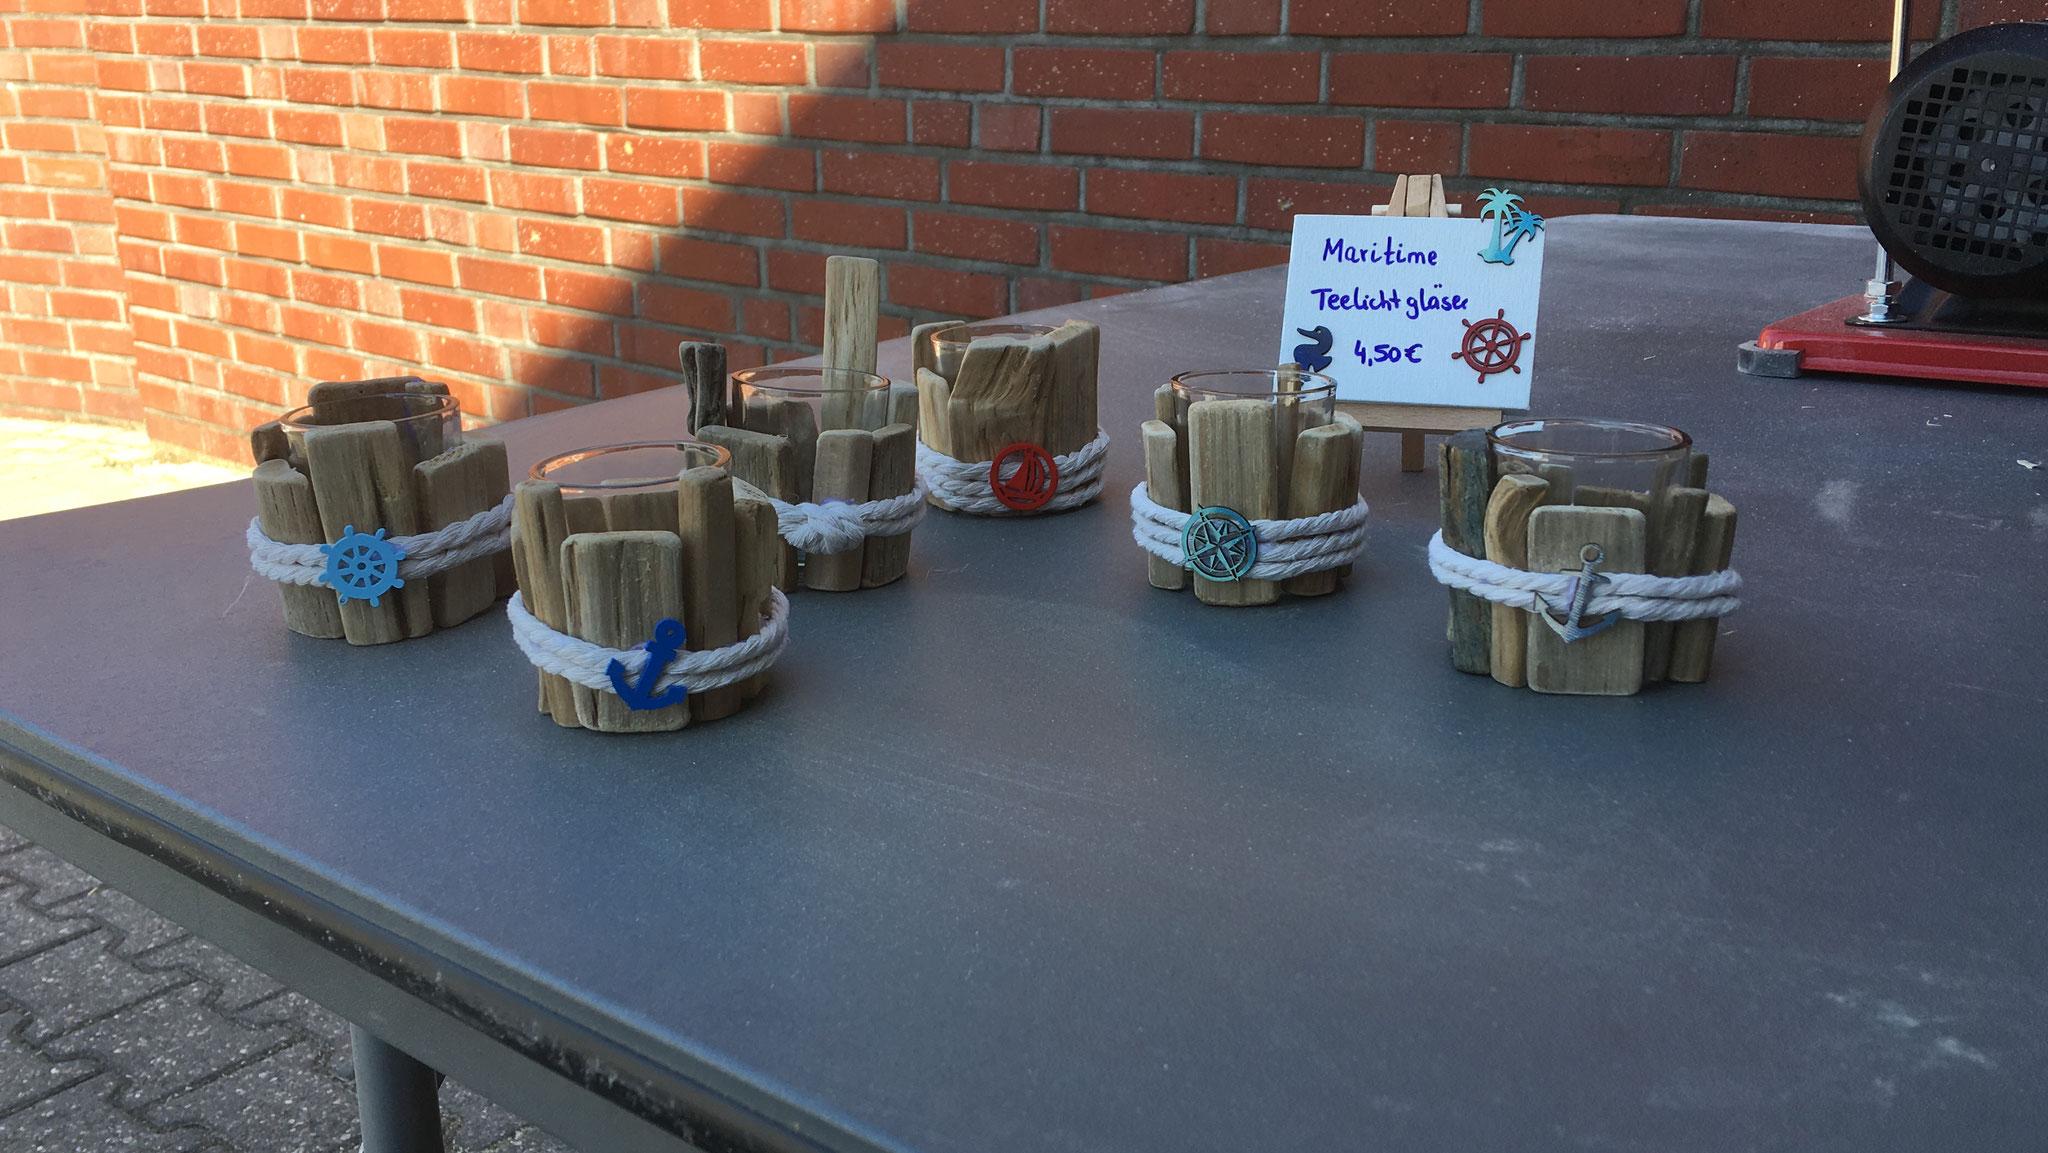 maritime Teelichtgläser je 4,50€